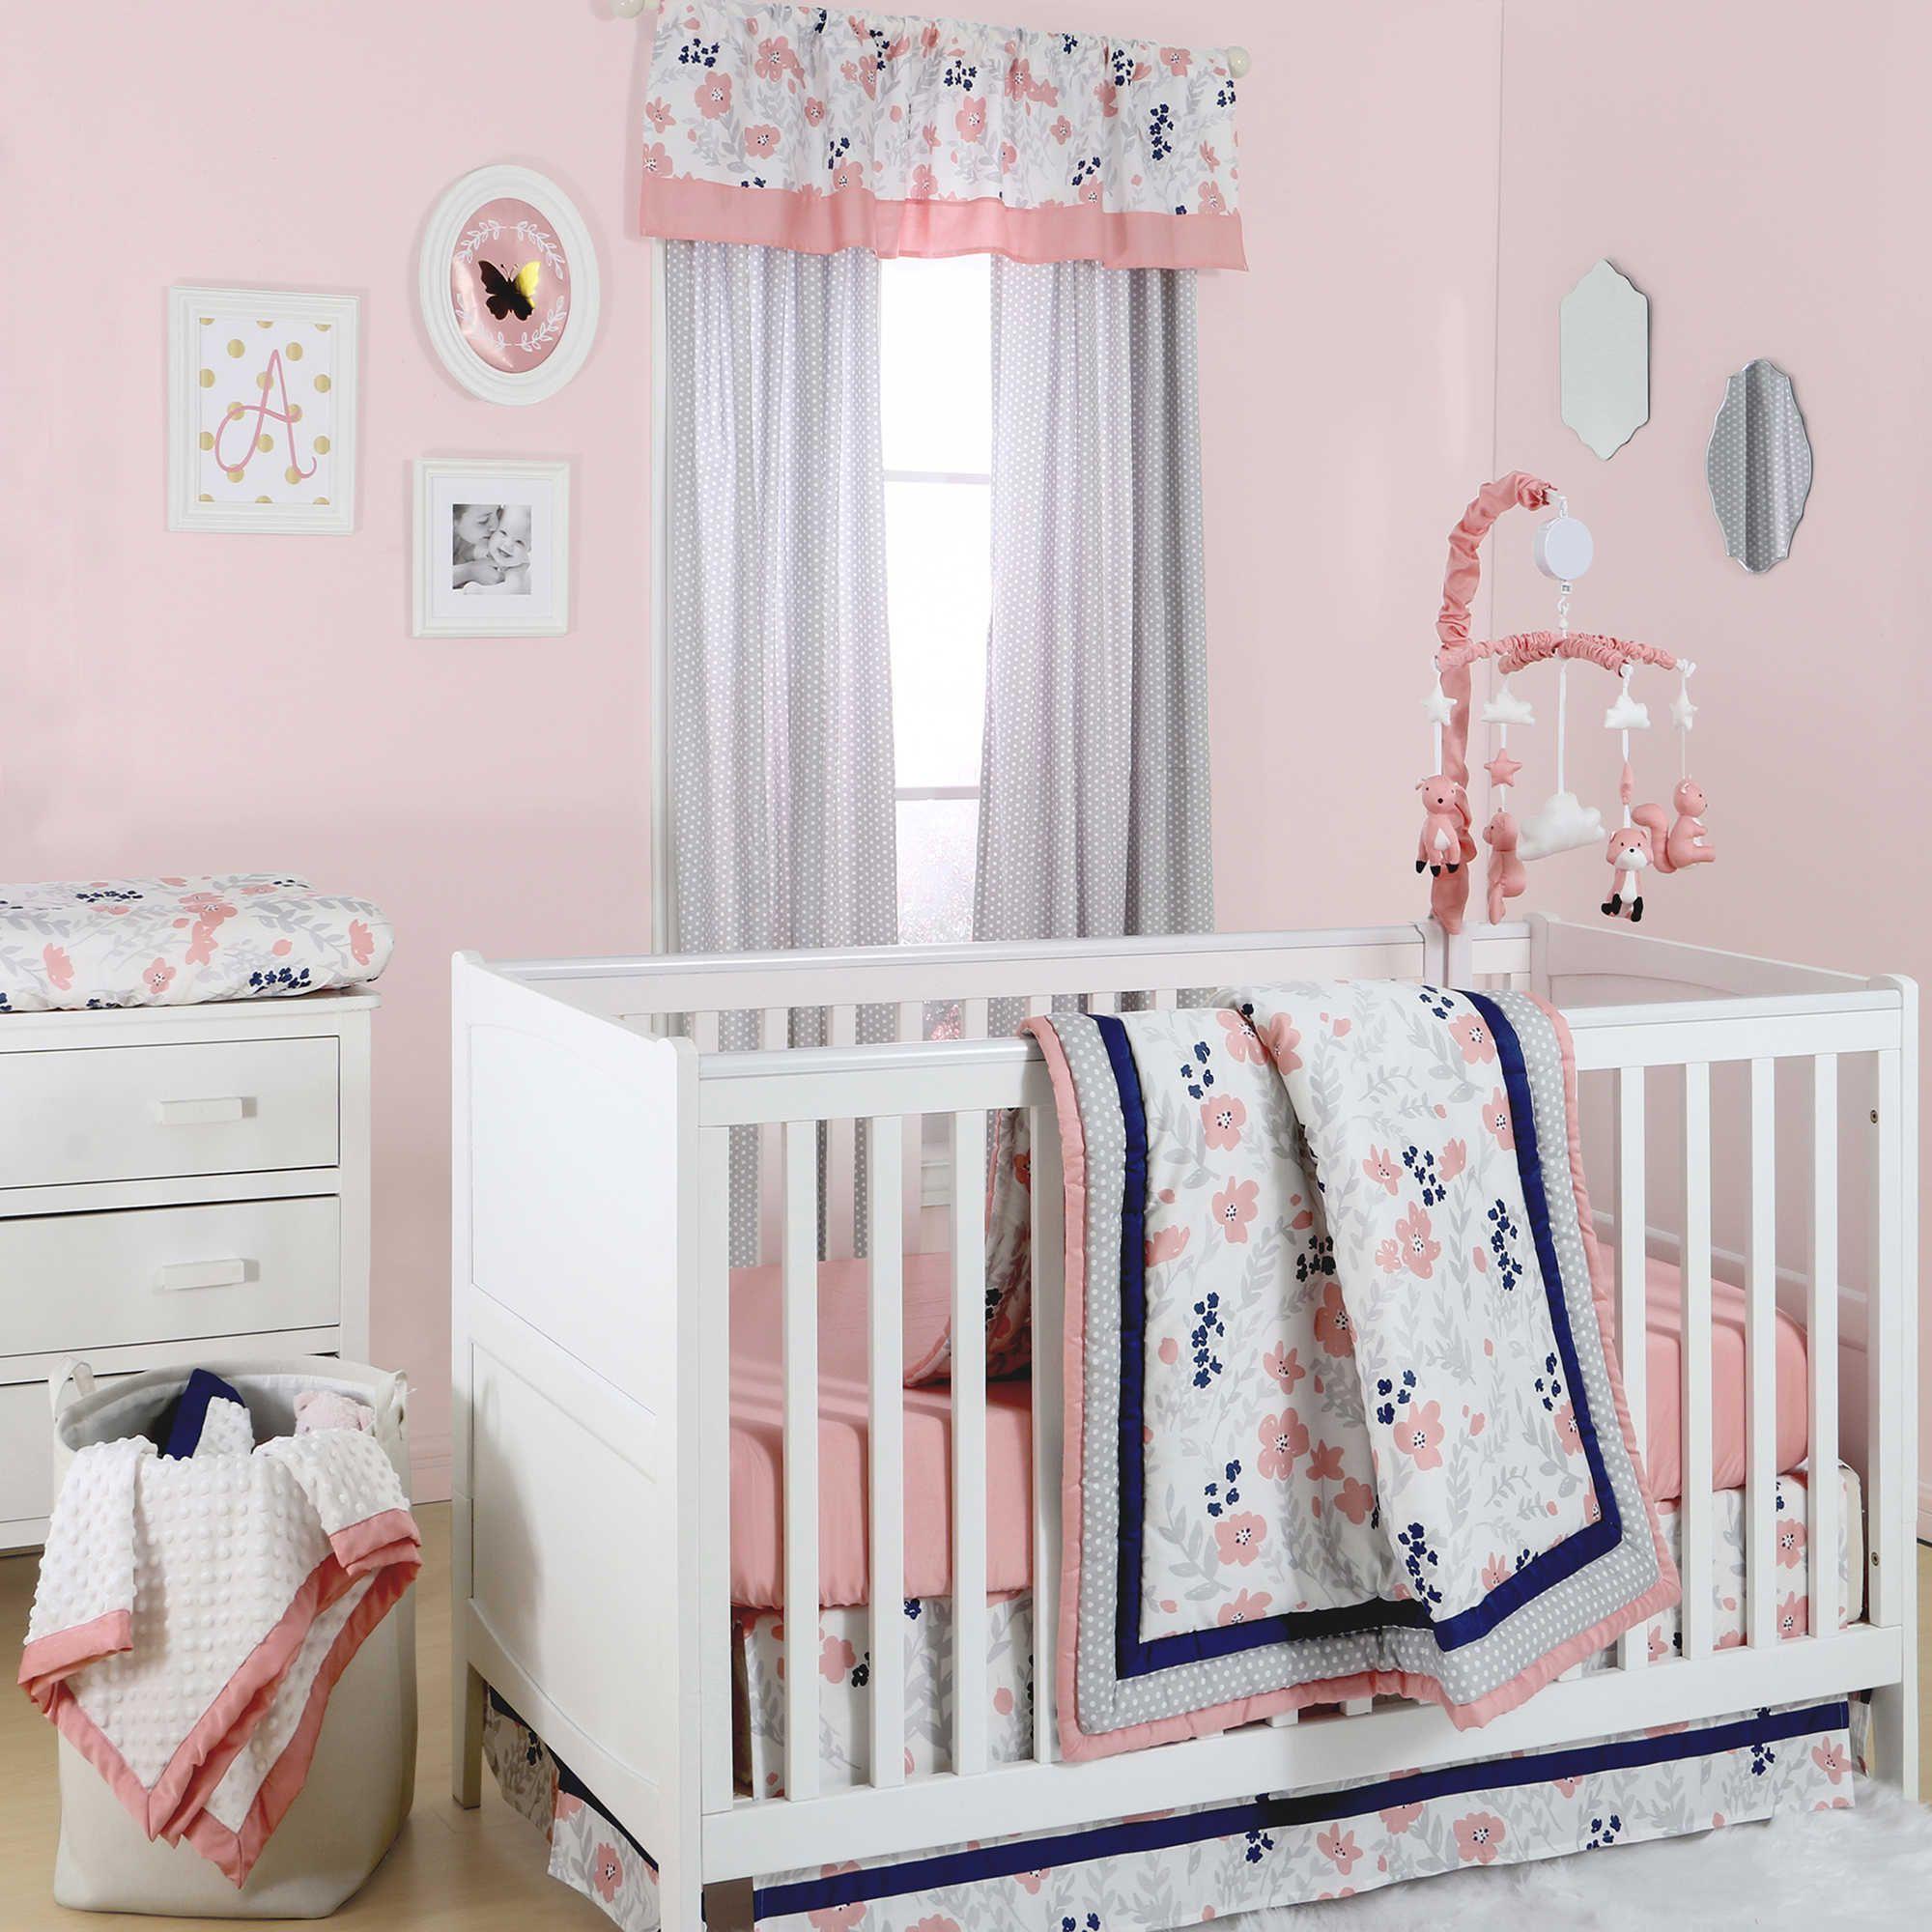 pink floral crib bedding piece set baby cribs watercolor